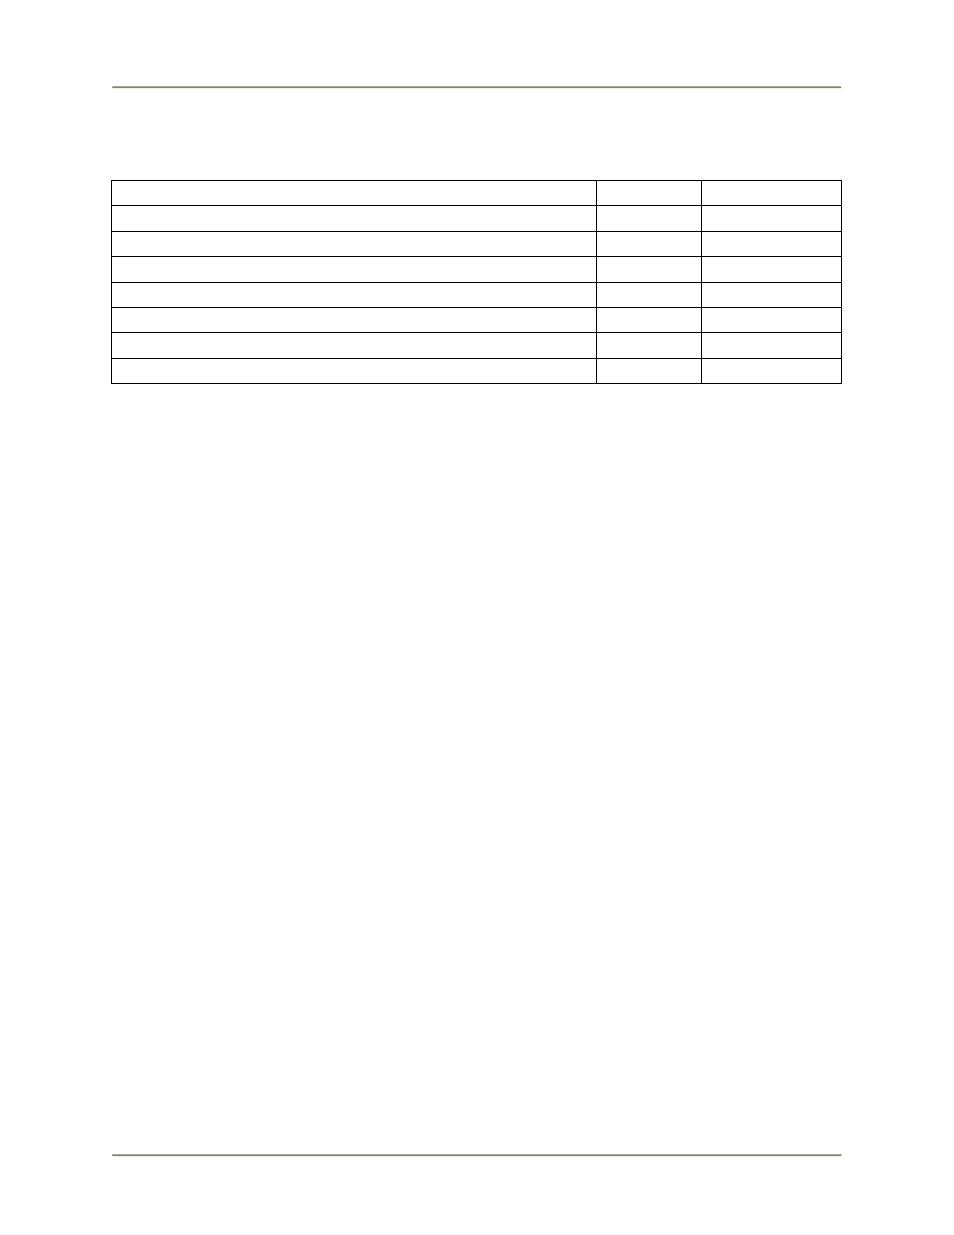 medium resolution of 240v 3 phase wiring diagram